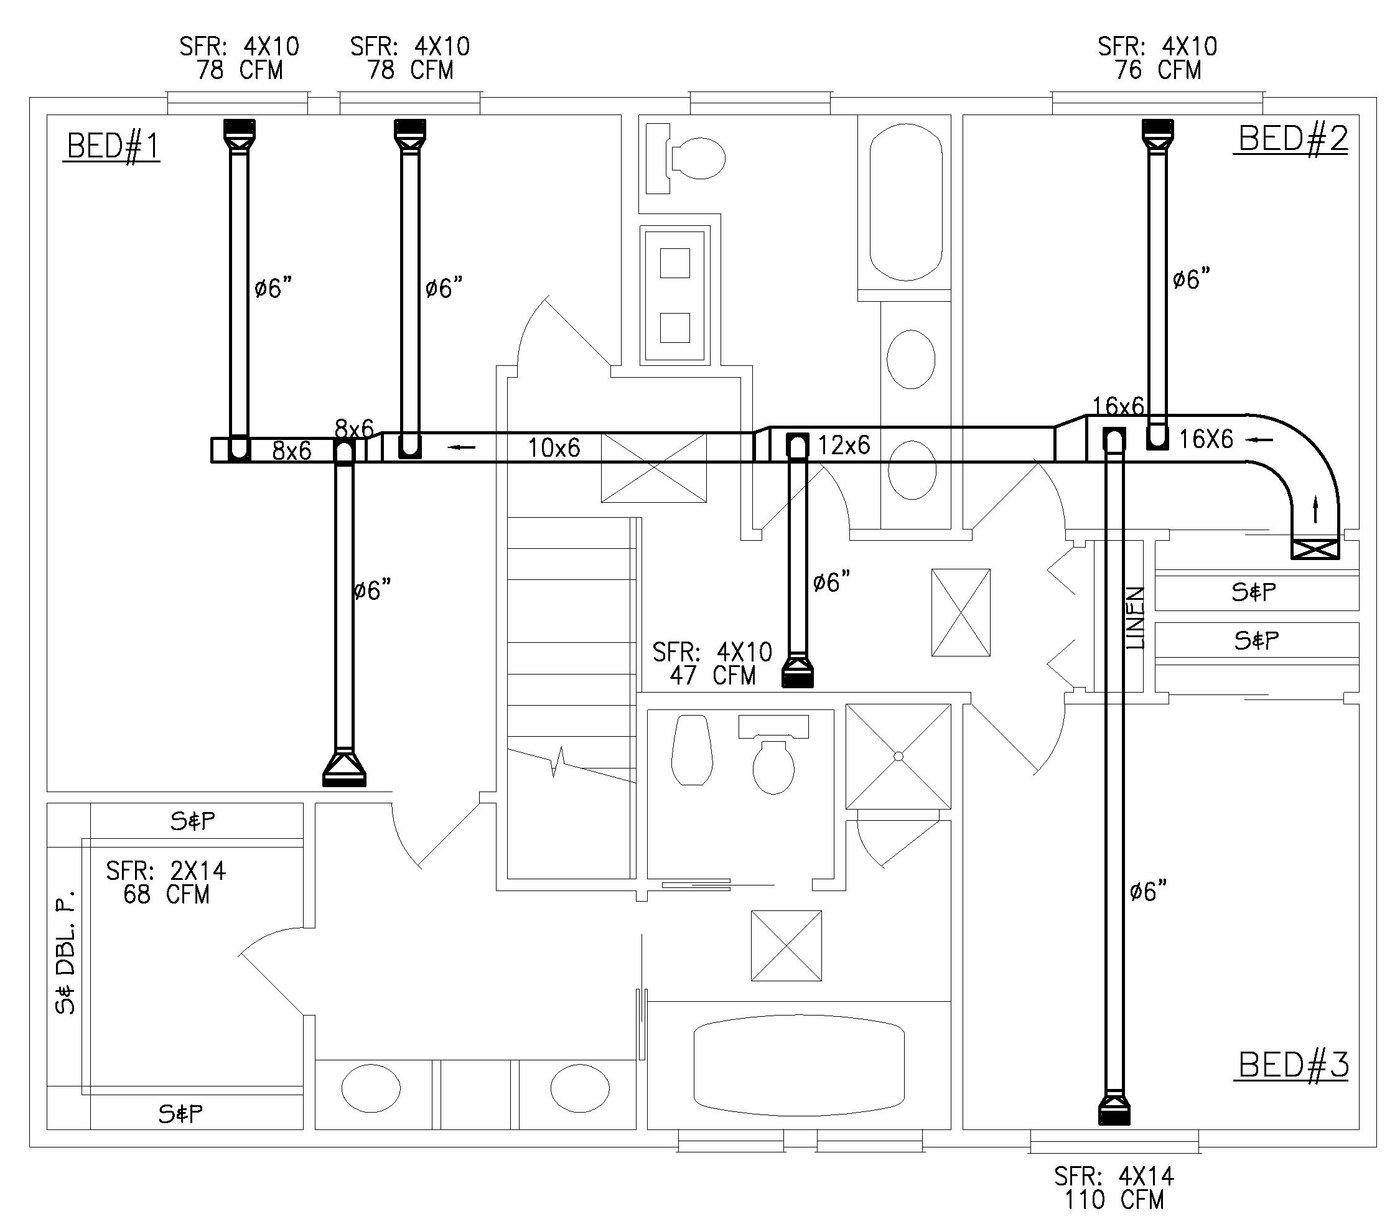 Hvac Plans By Raymond Alberga At Coroflot